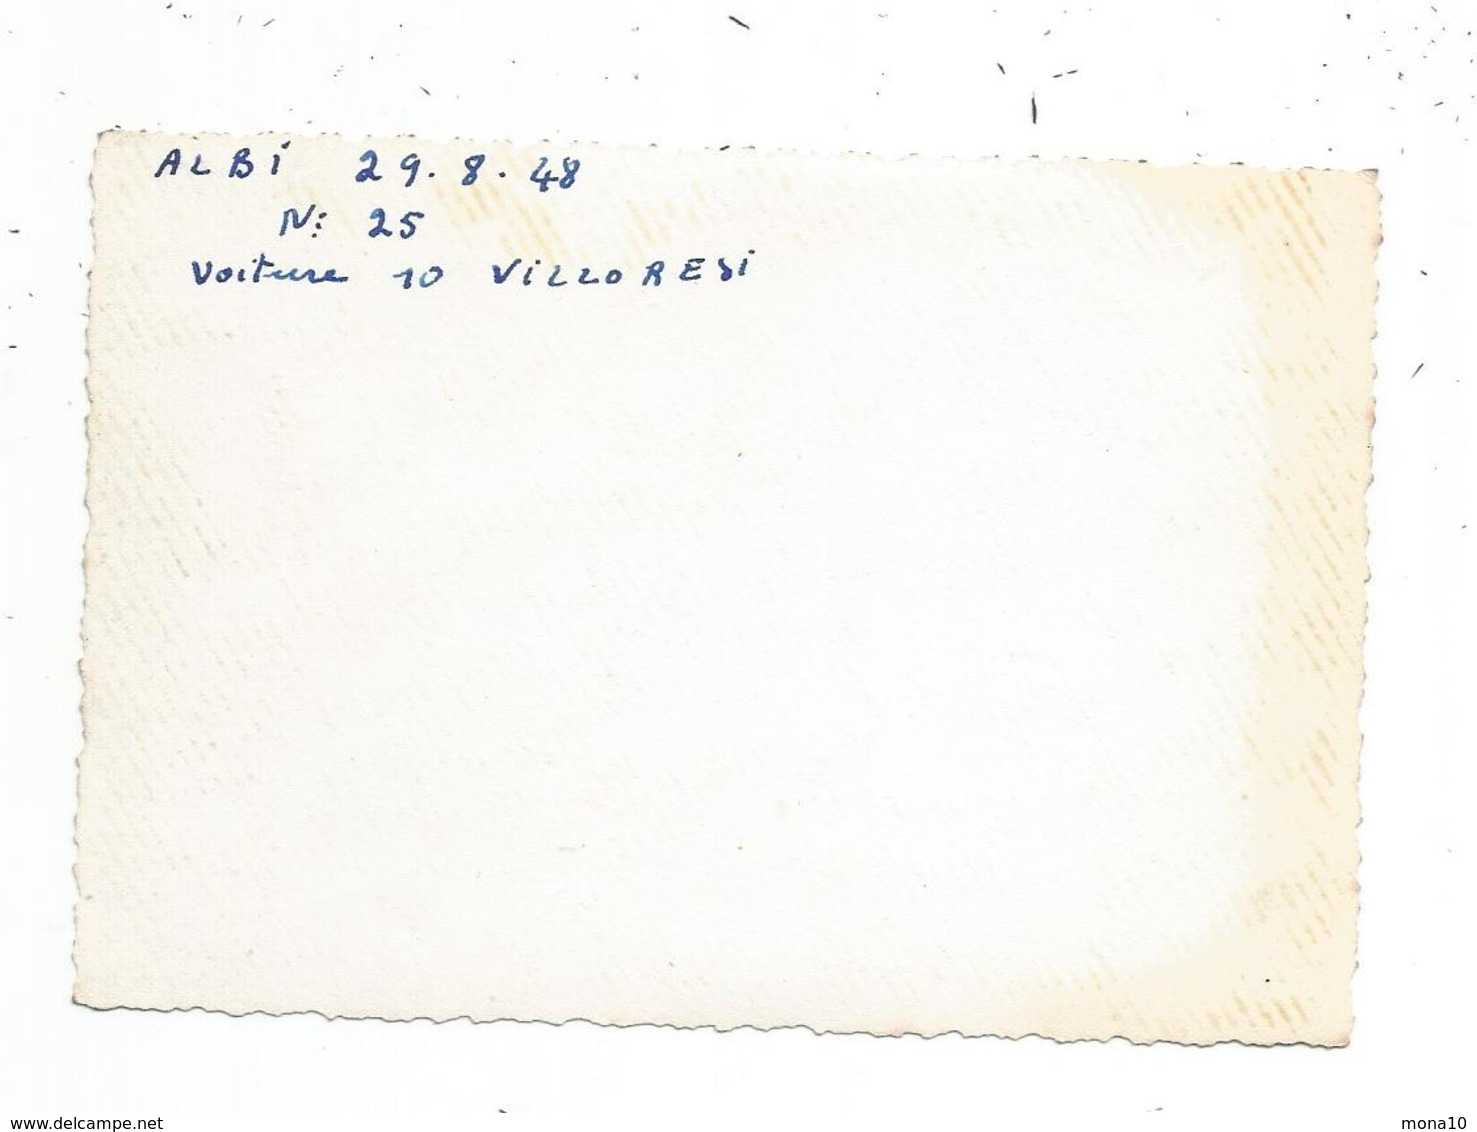 Photo Originale -Course Automobile -voiture De Course - 1948; Pilote Villoresi ; Albi - Cars